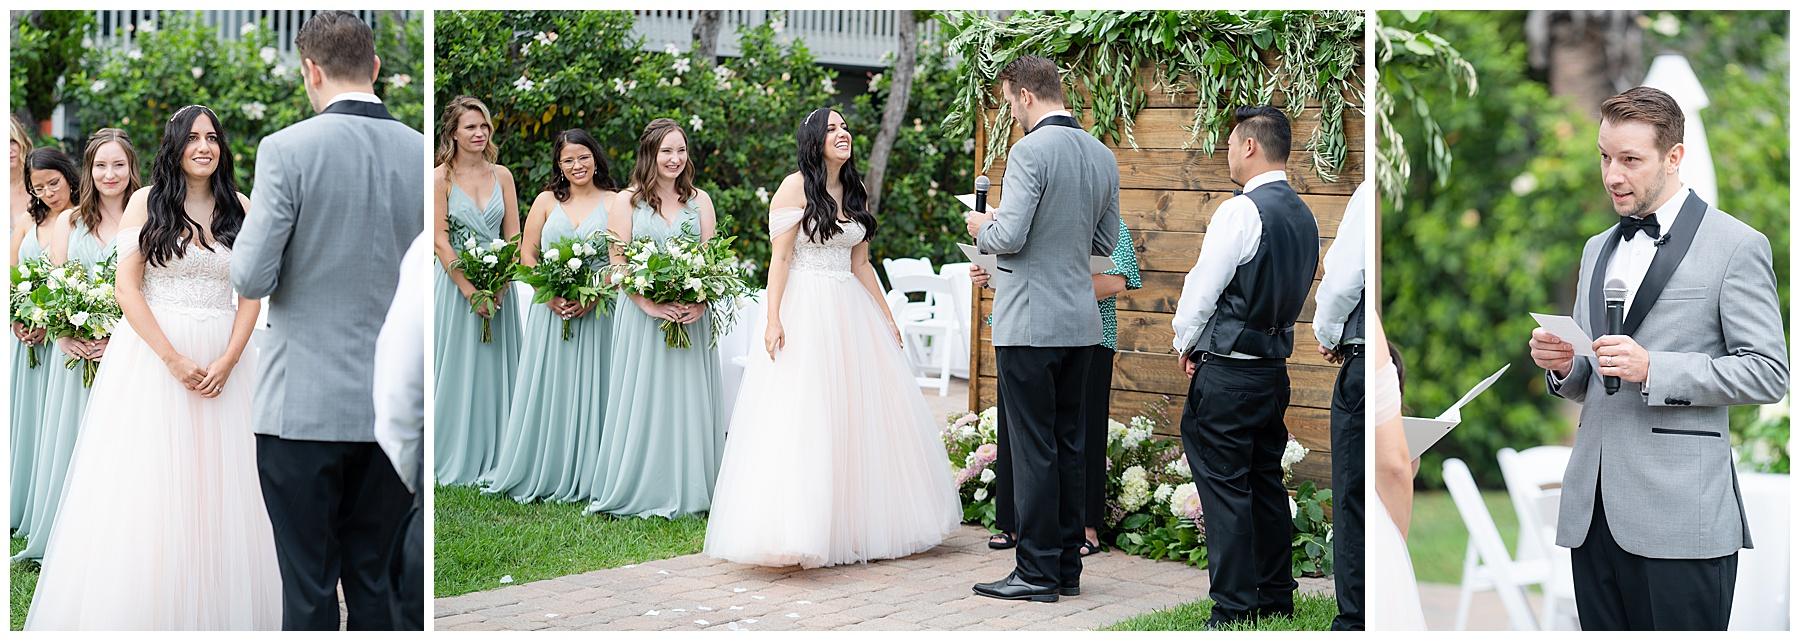 anaheim hotel wedding ceremony